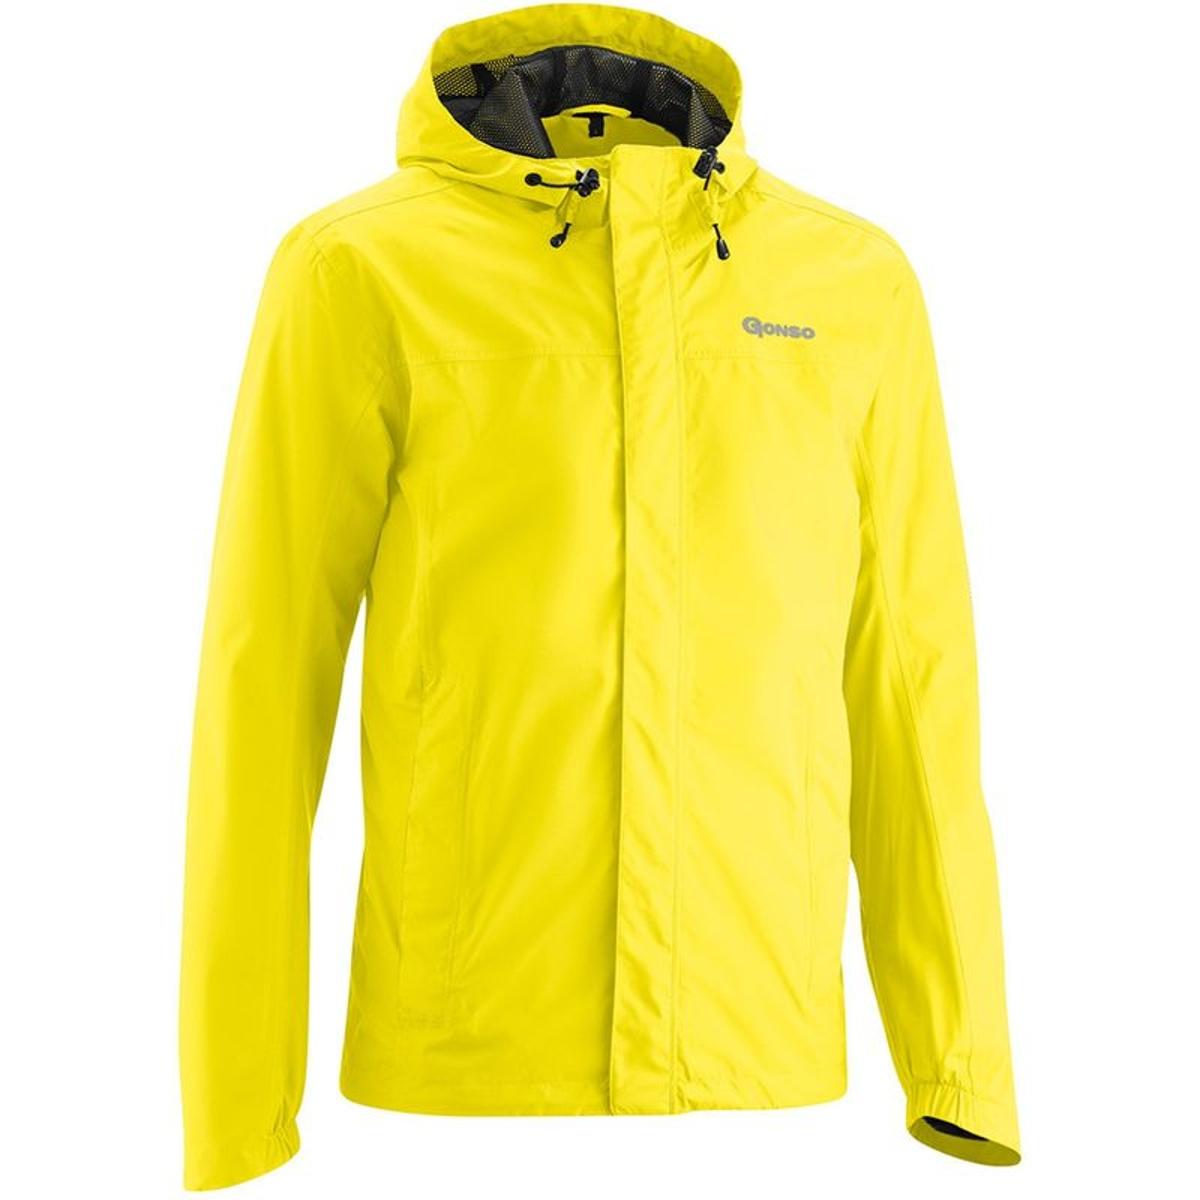 Save Light - Veste Homme - jaune